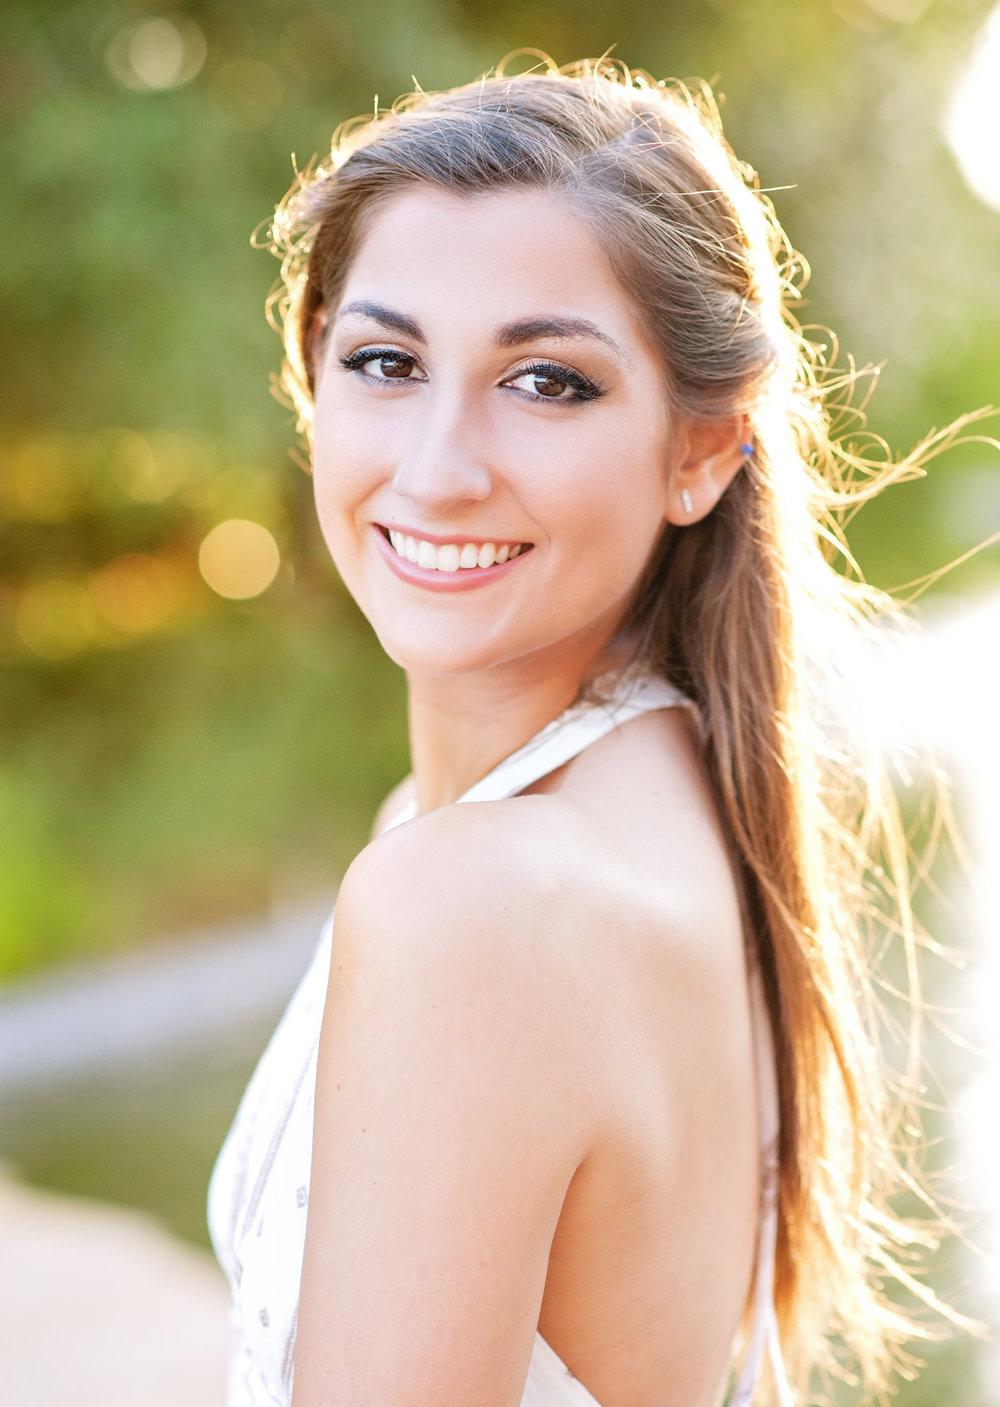 South Florida-photography-professional photographer-photography website-local photographer-teens-high school senior-photos-portrait photographer-118.jpg